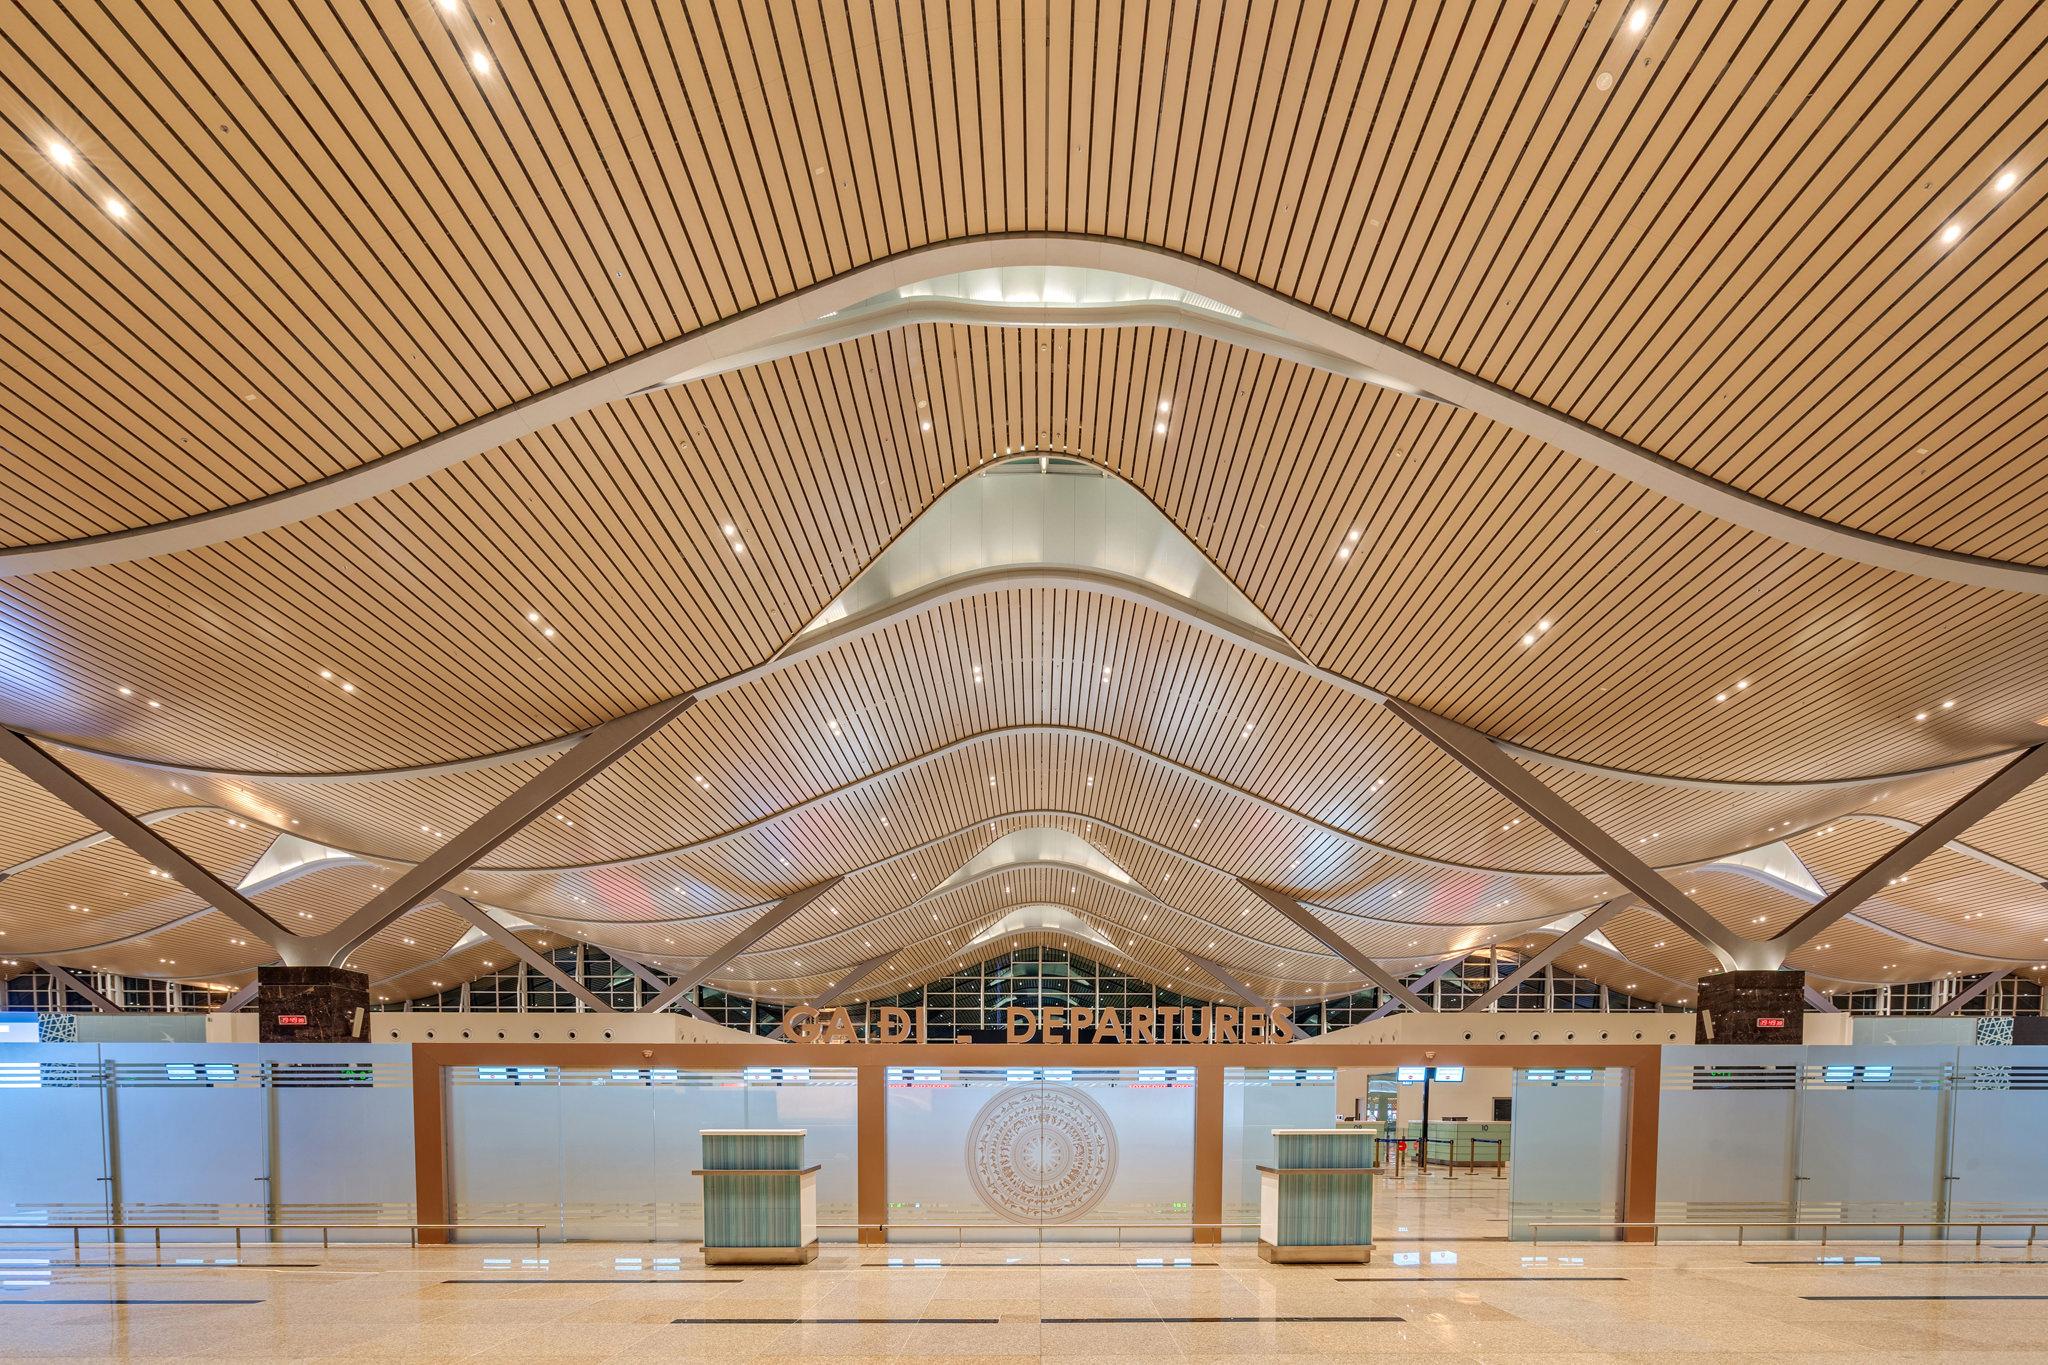 20180626 - Cam Ranh Airport - Architecture - 0436.jpg